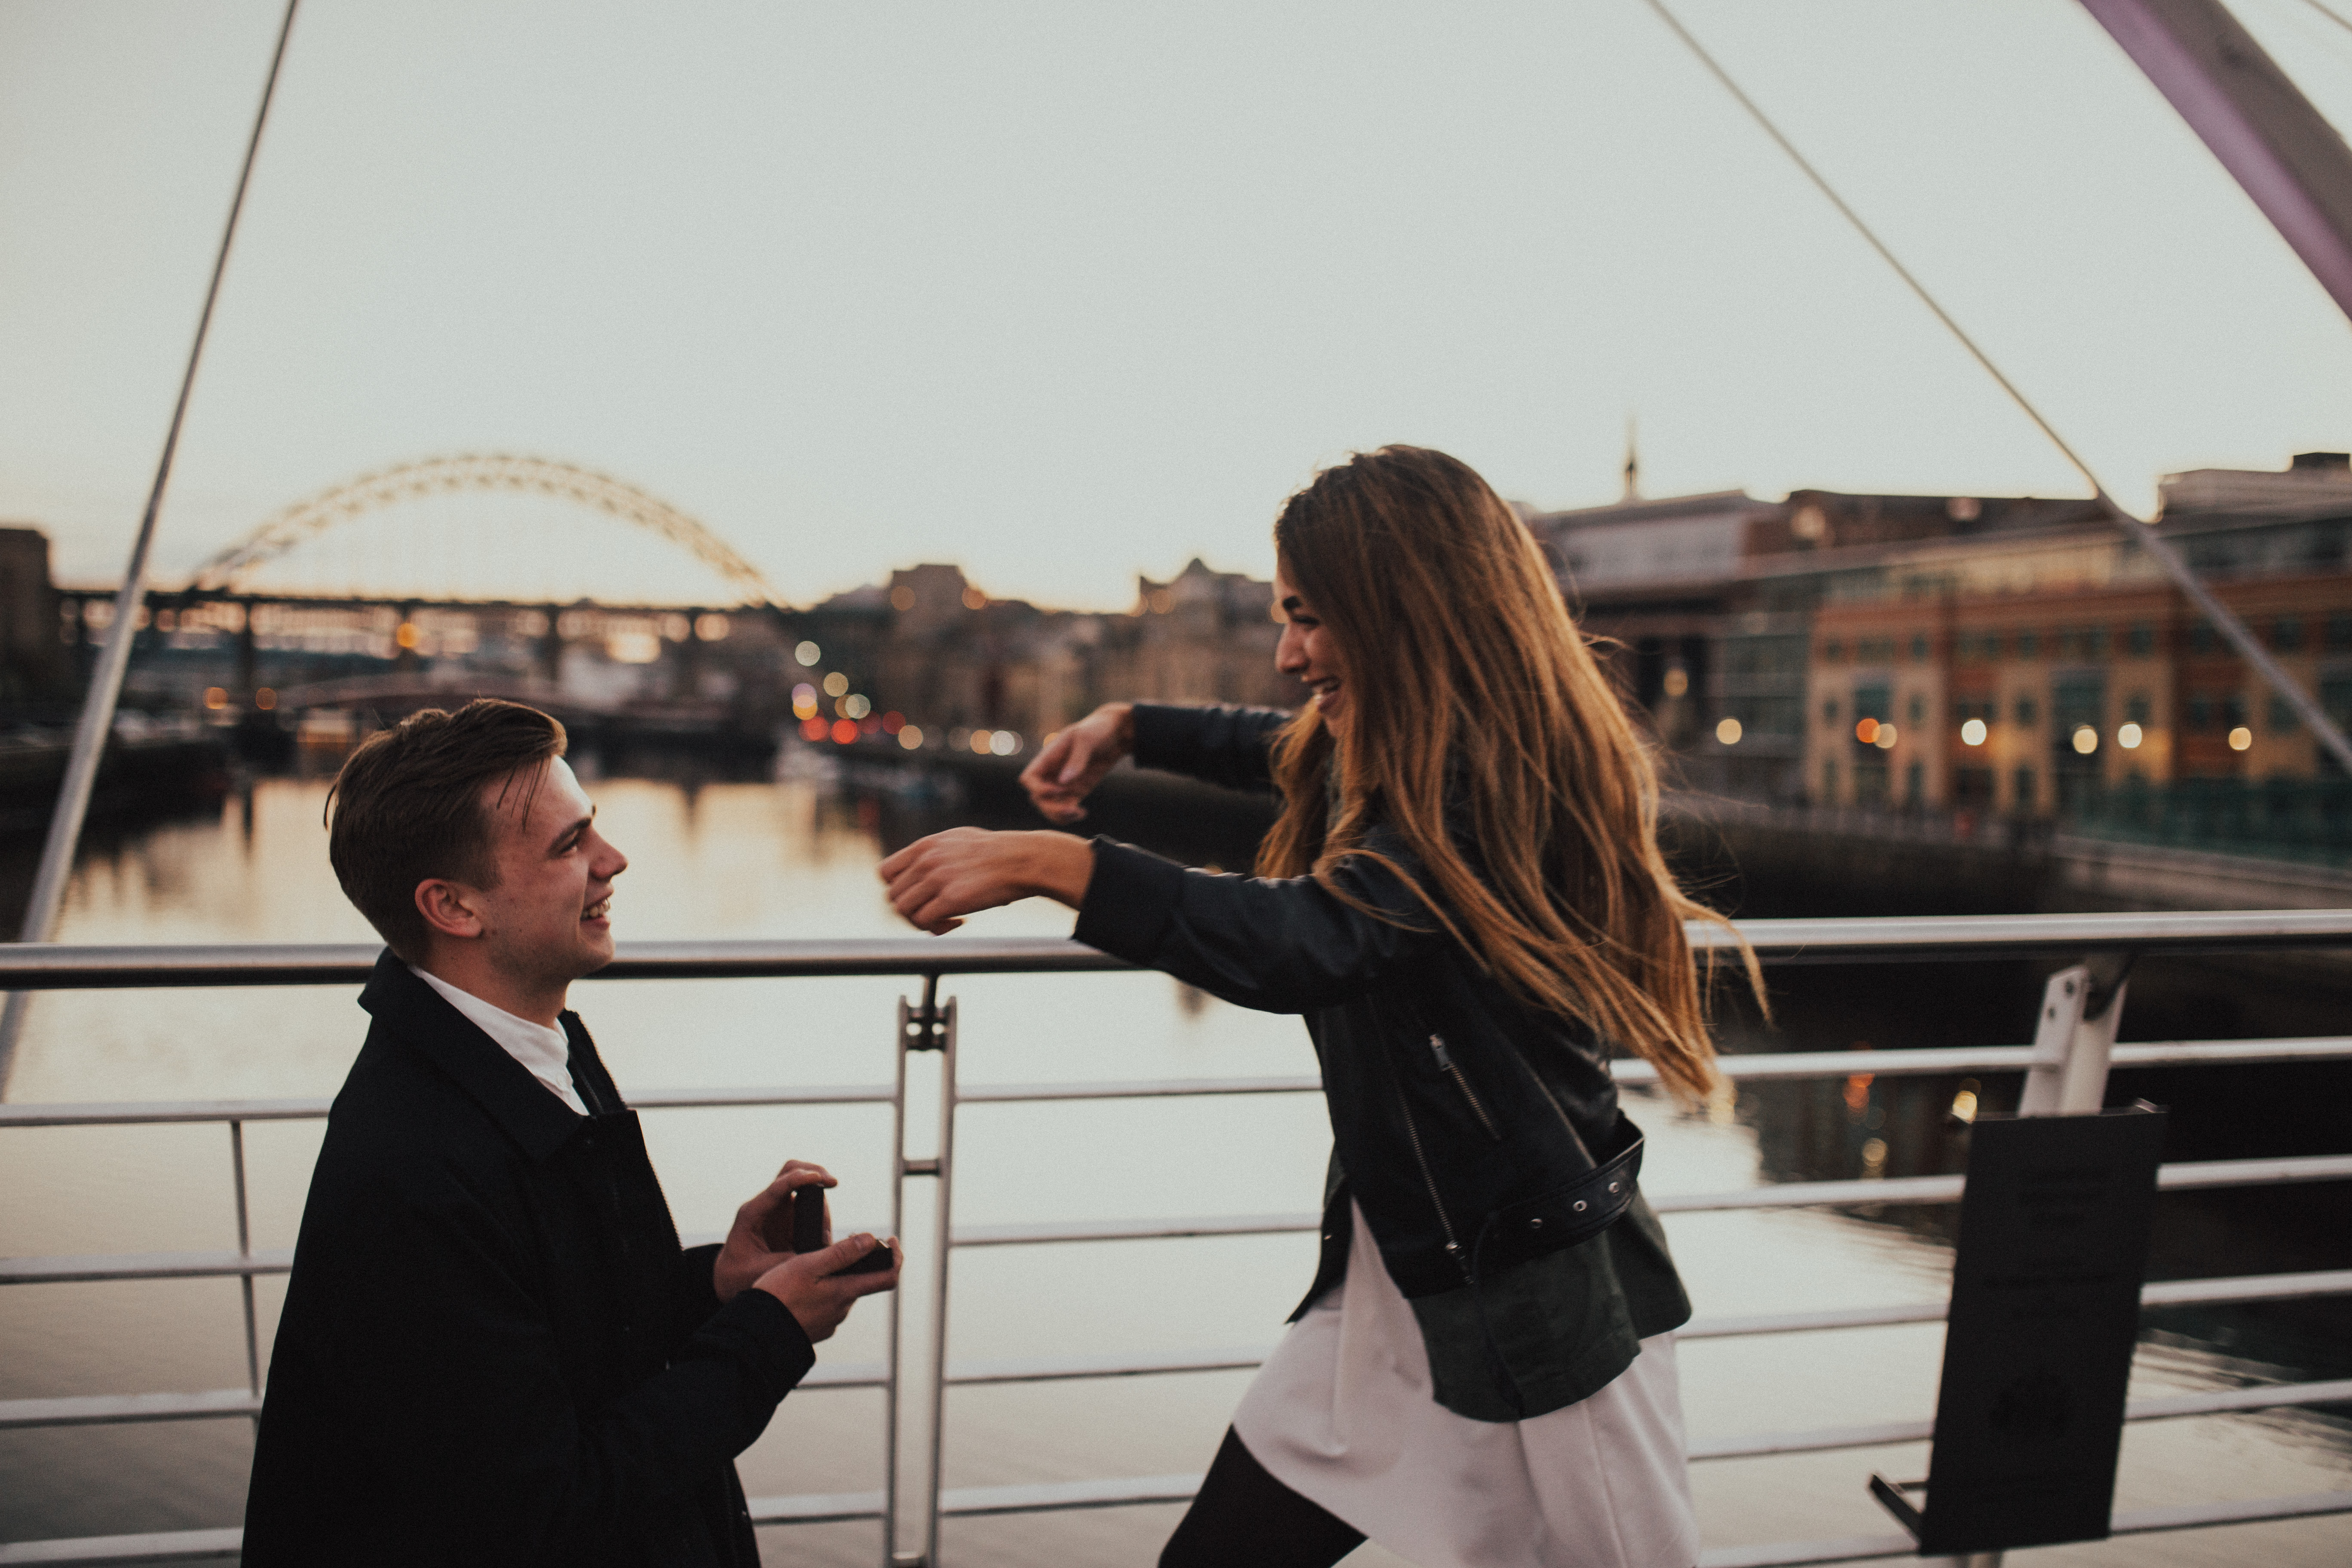 Marriage Proposal Ideas in Newcastle, UK